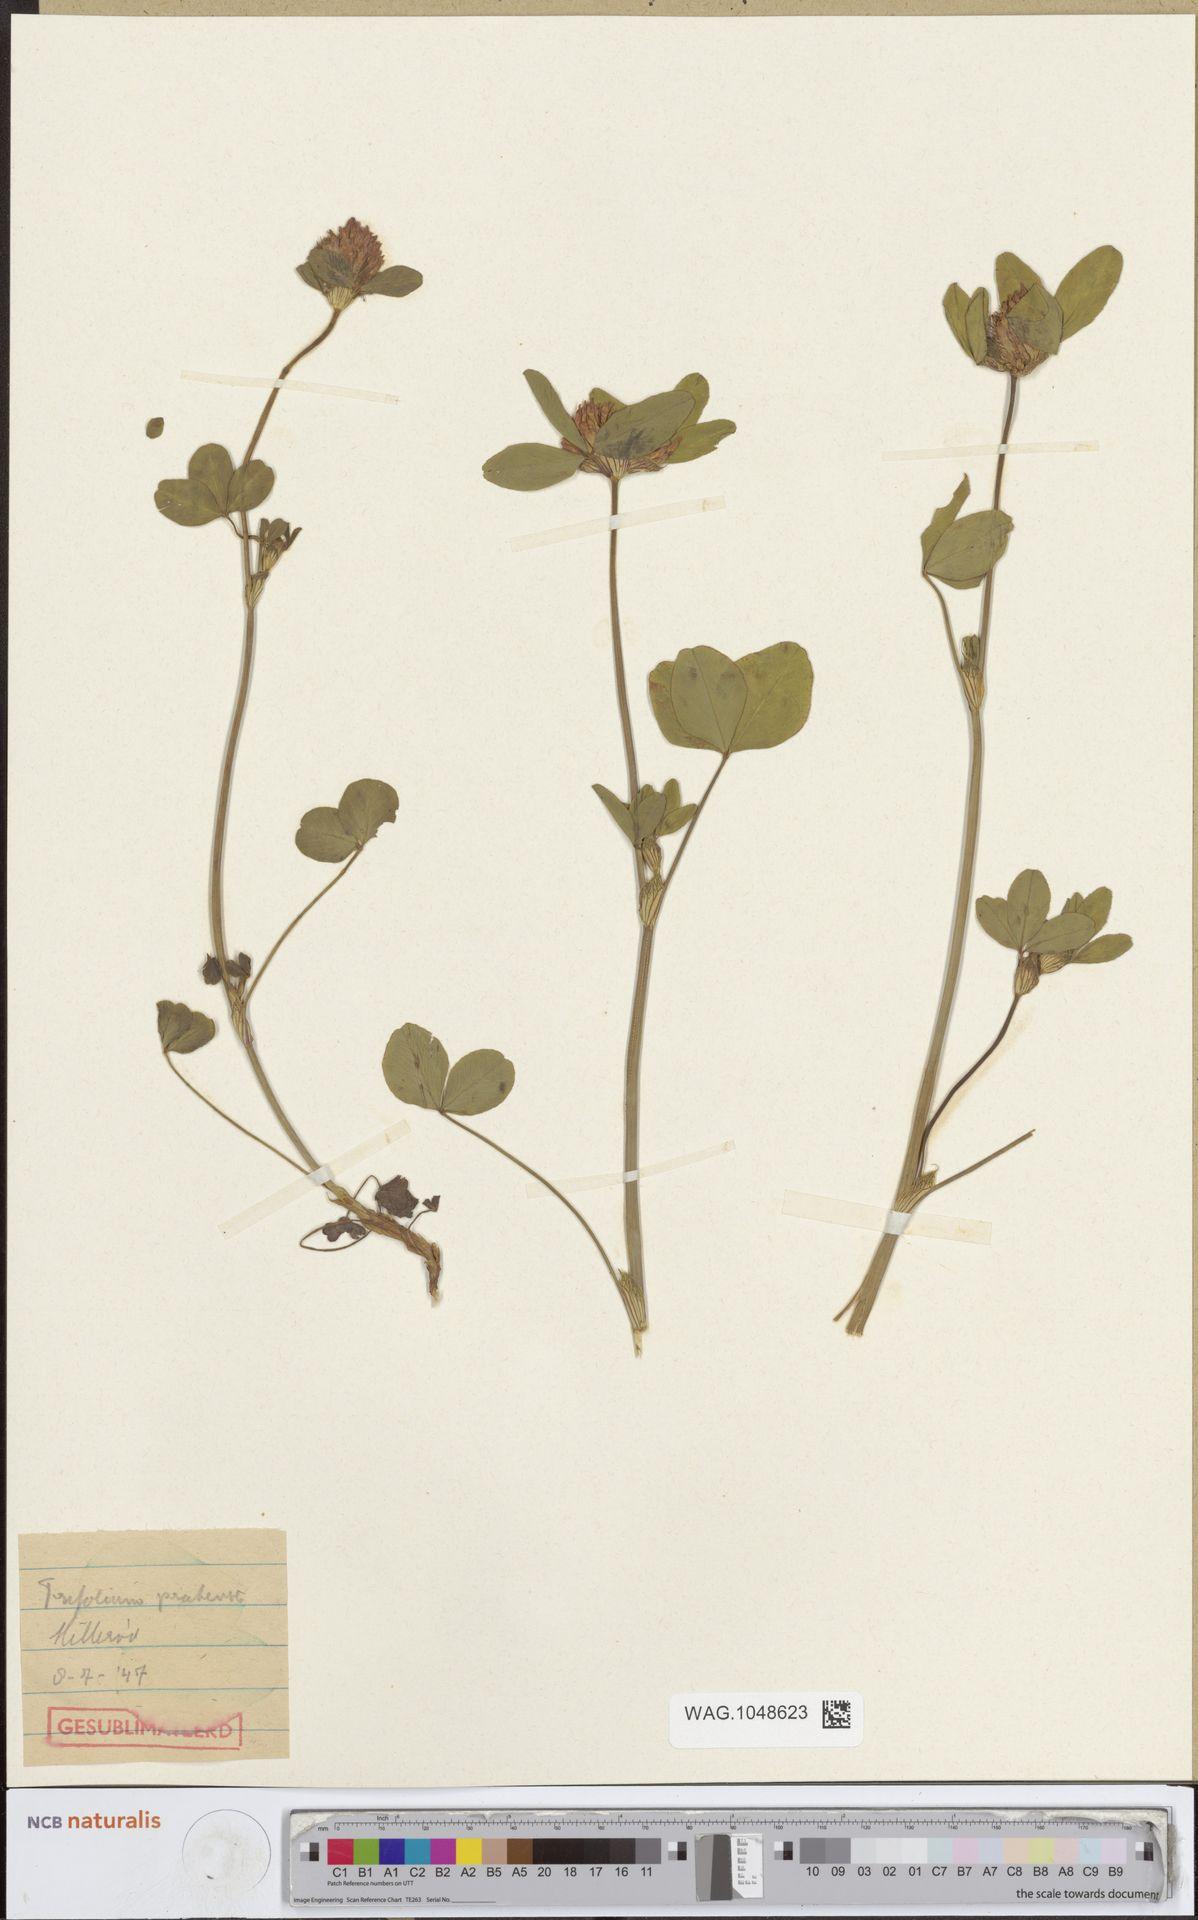 WAG.1048623   Trifolium pratense L.